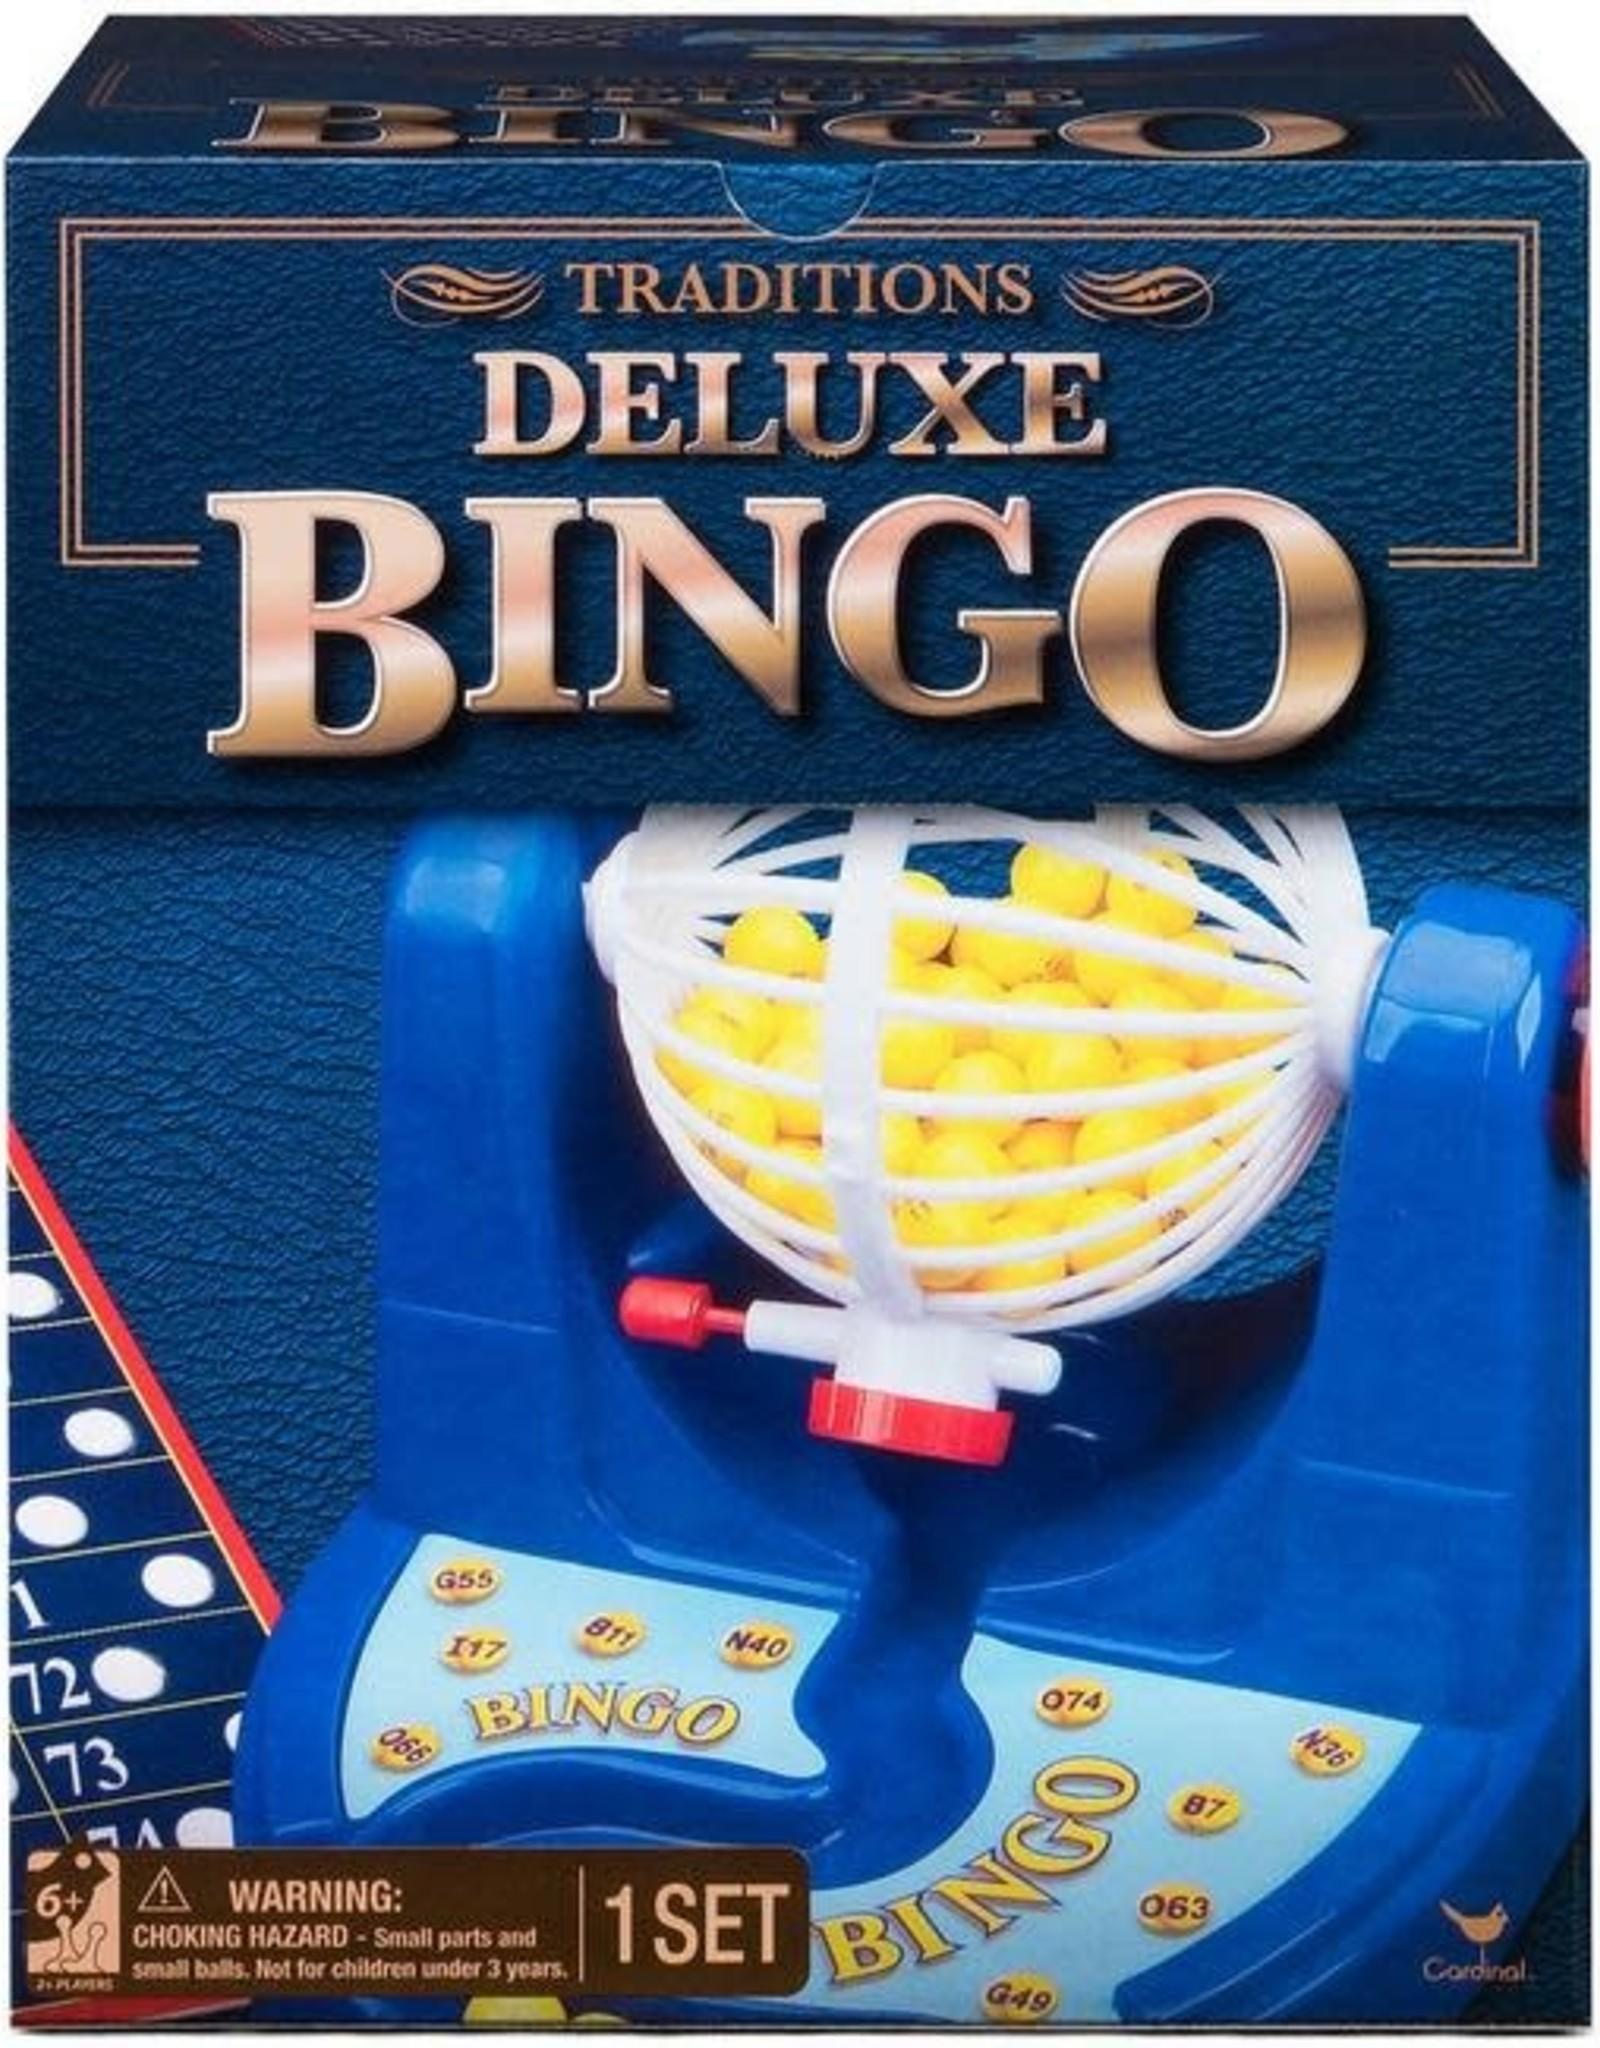 Traditions Deluxe Bingo Set